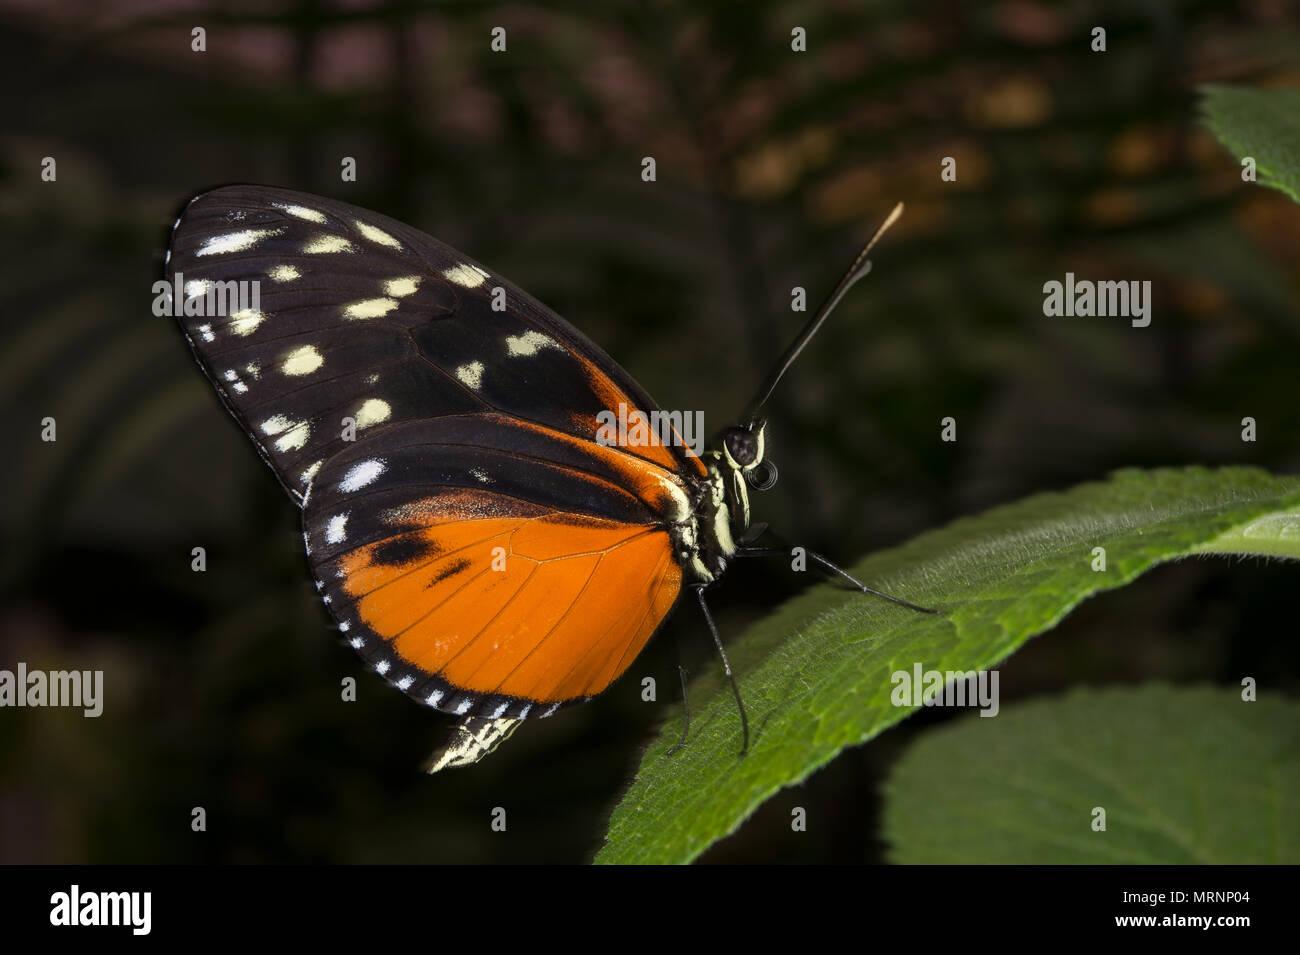 Crema-spotted Tigerwing o variabile, Prestonian Thitorea tarracina, Nymphalidae, Costa Rica, Centroamerica Immagini Stock